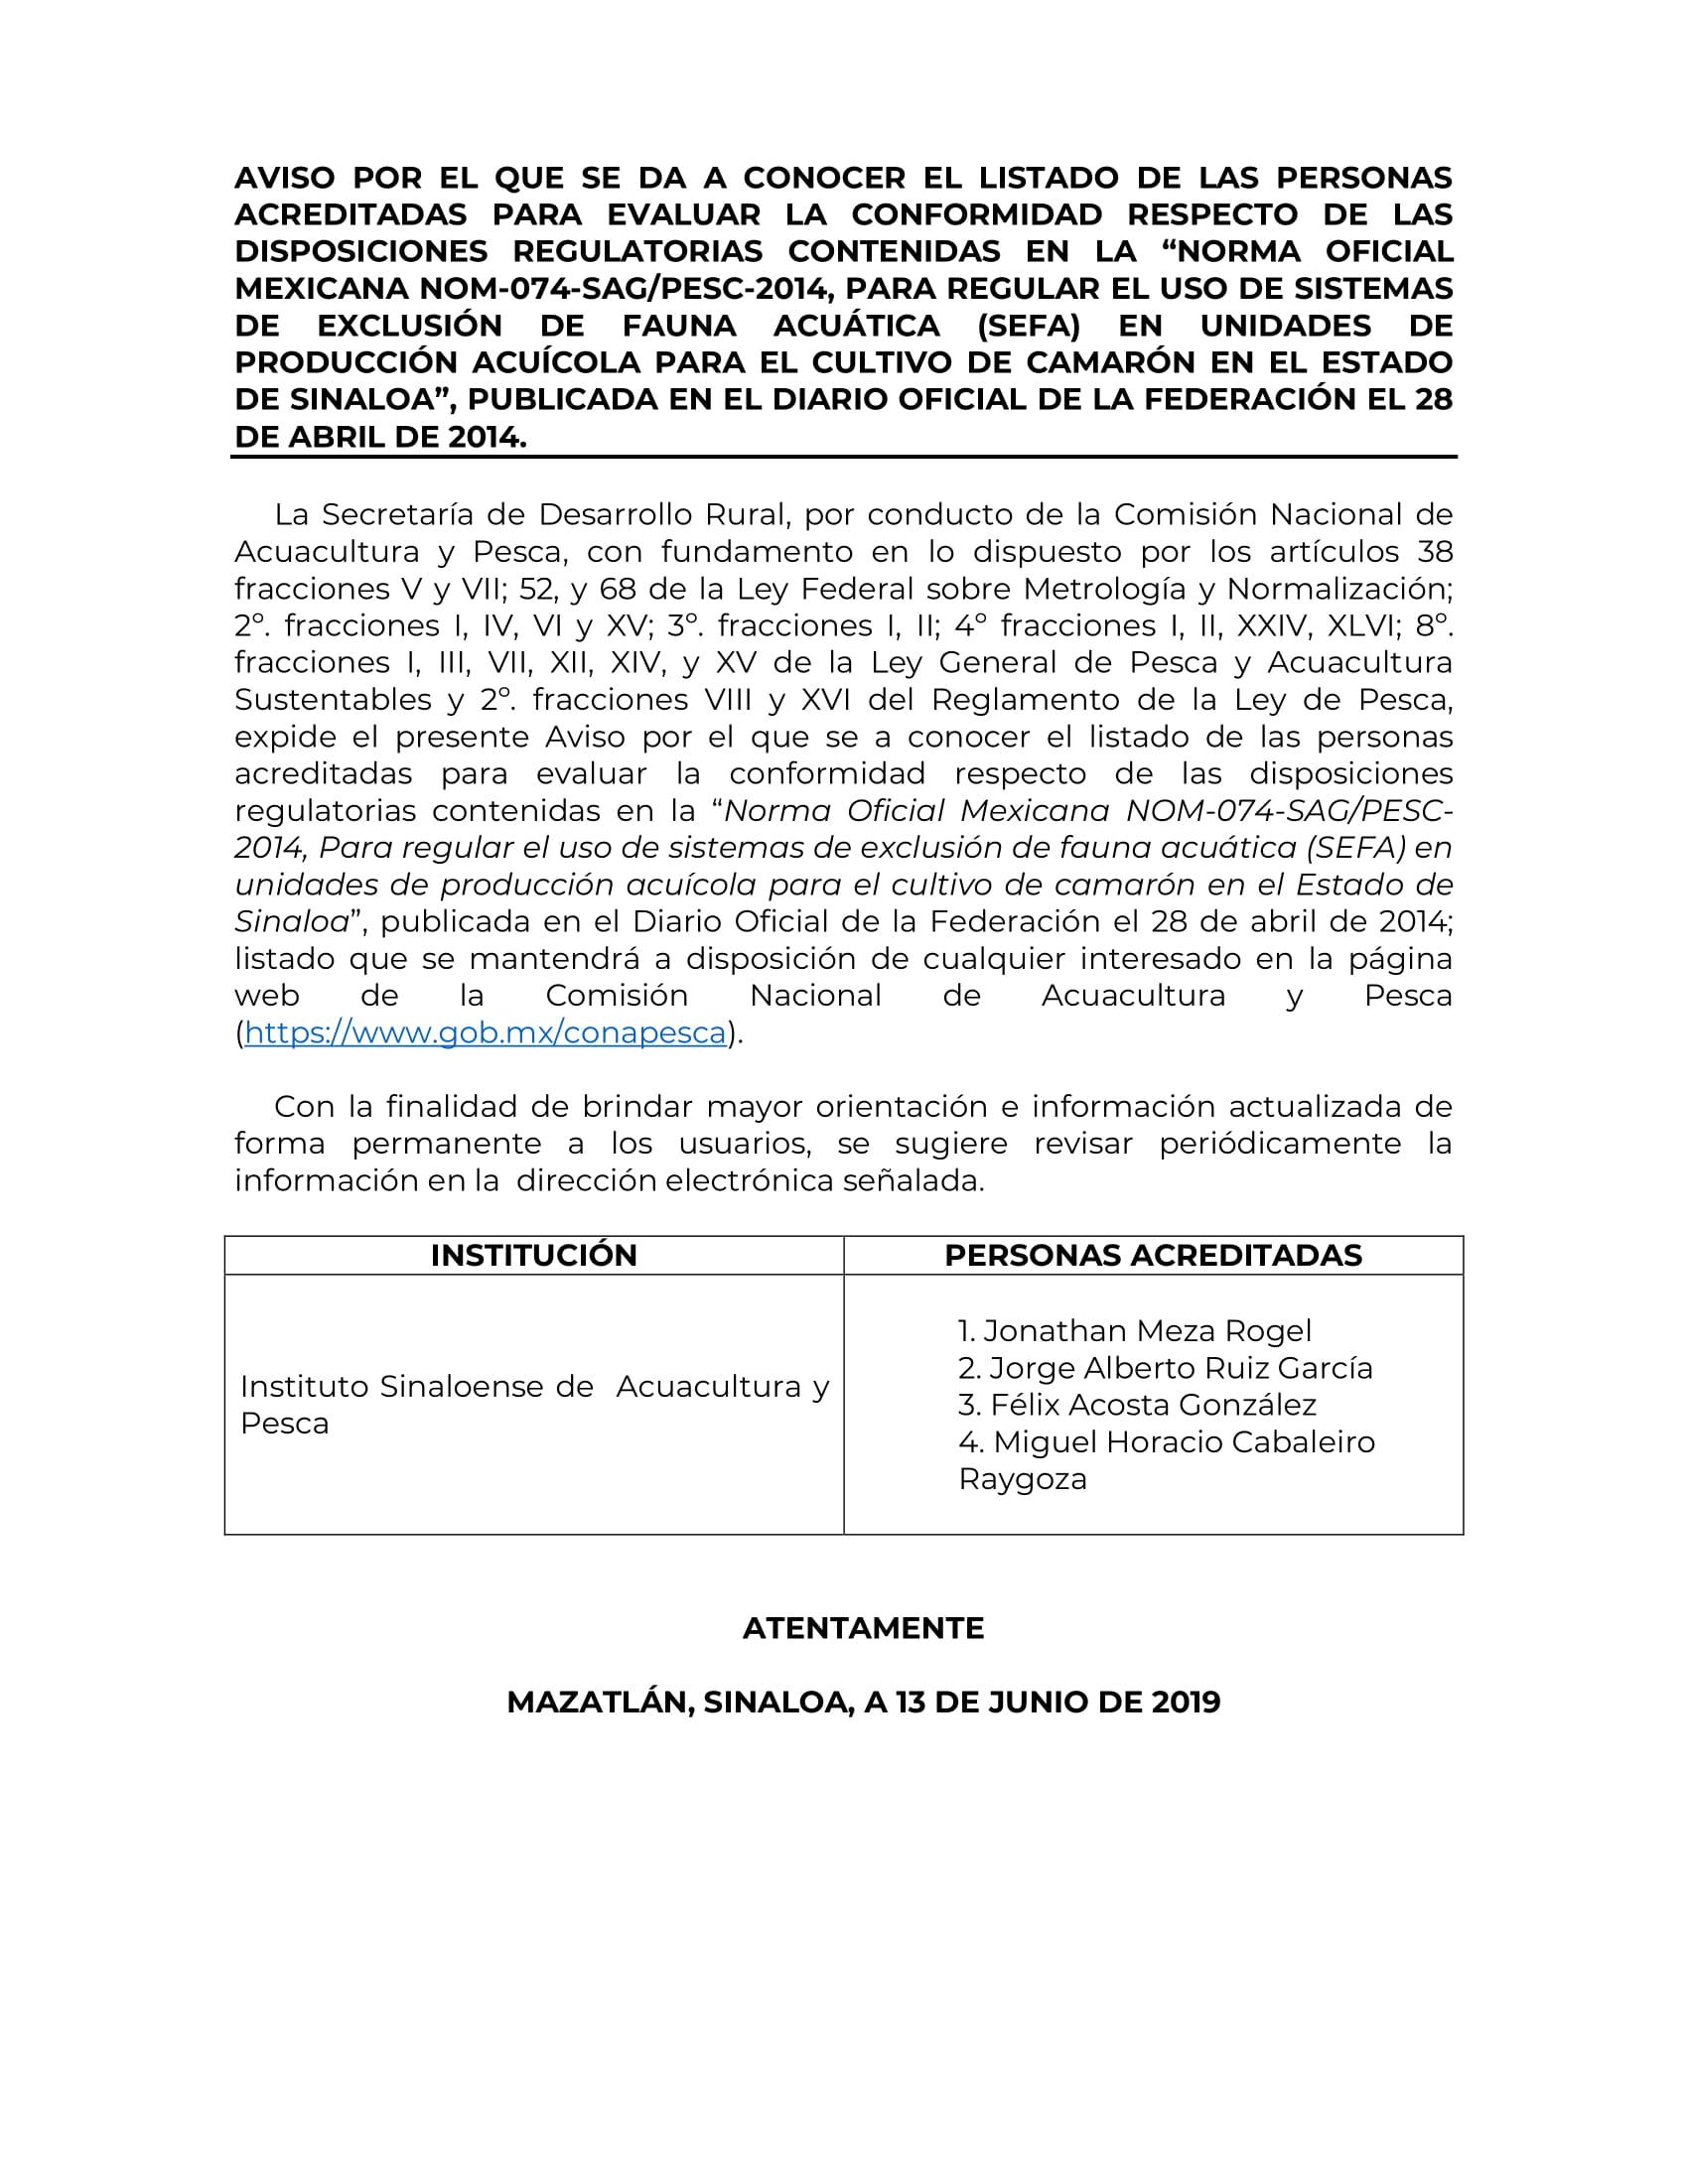 /cms/uploads/image/file/505091/AVISO_Personas_Acreditadas_SEFAS_WEB_DGOPA-1.jpg